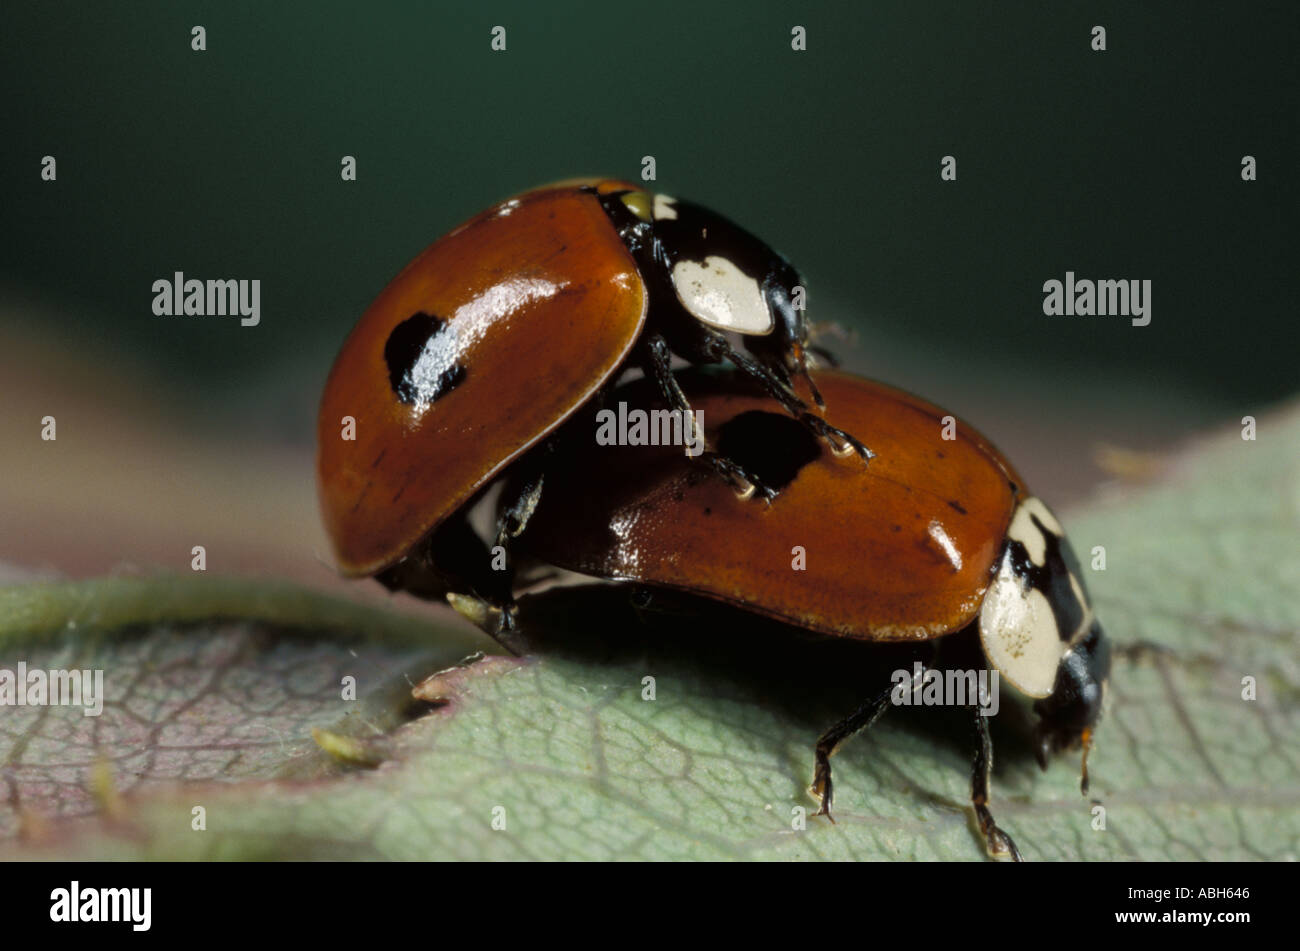 2 Spot Ladybird Pair Mating